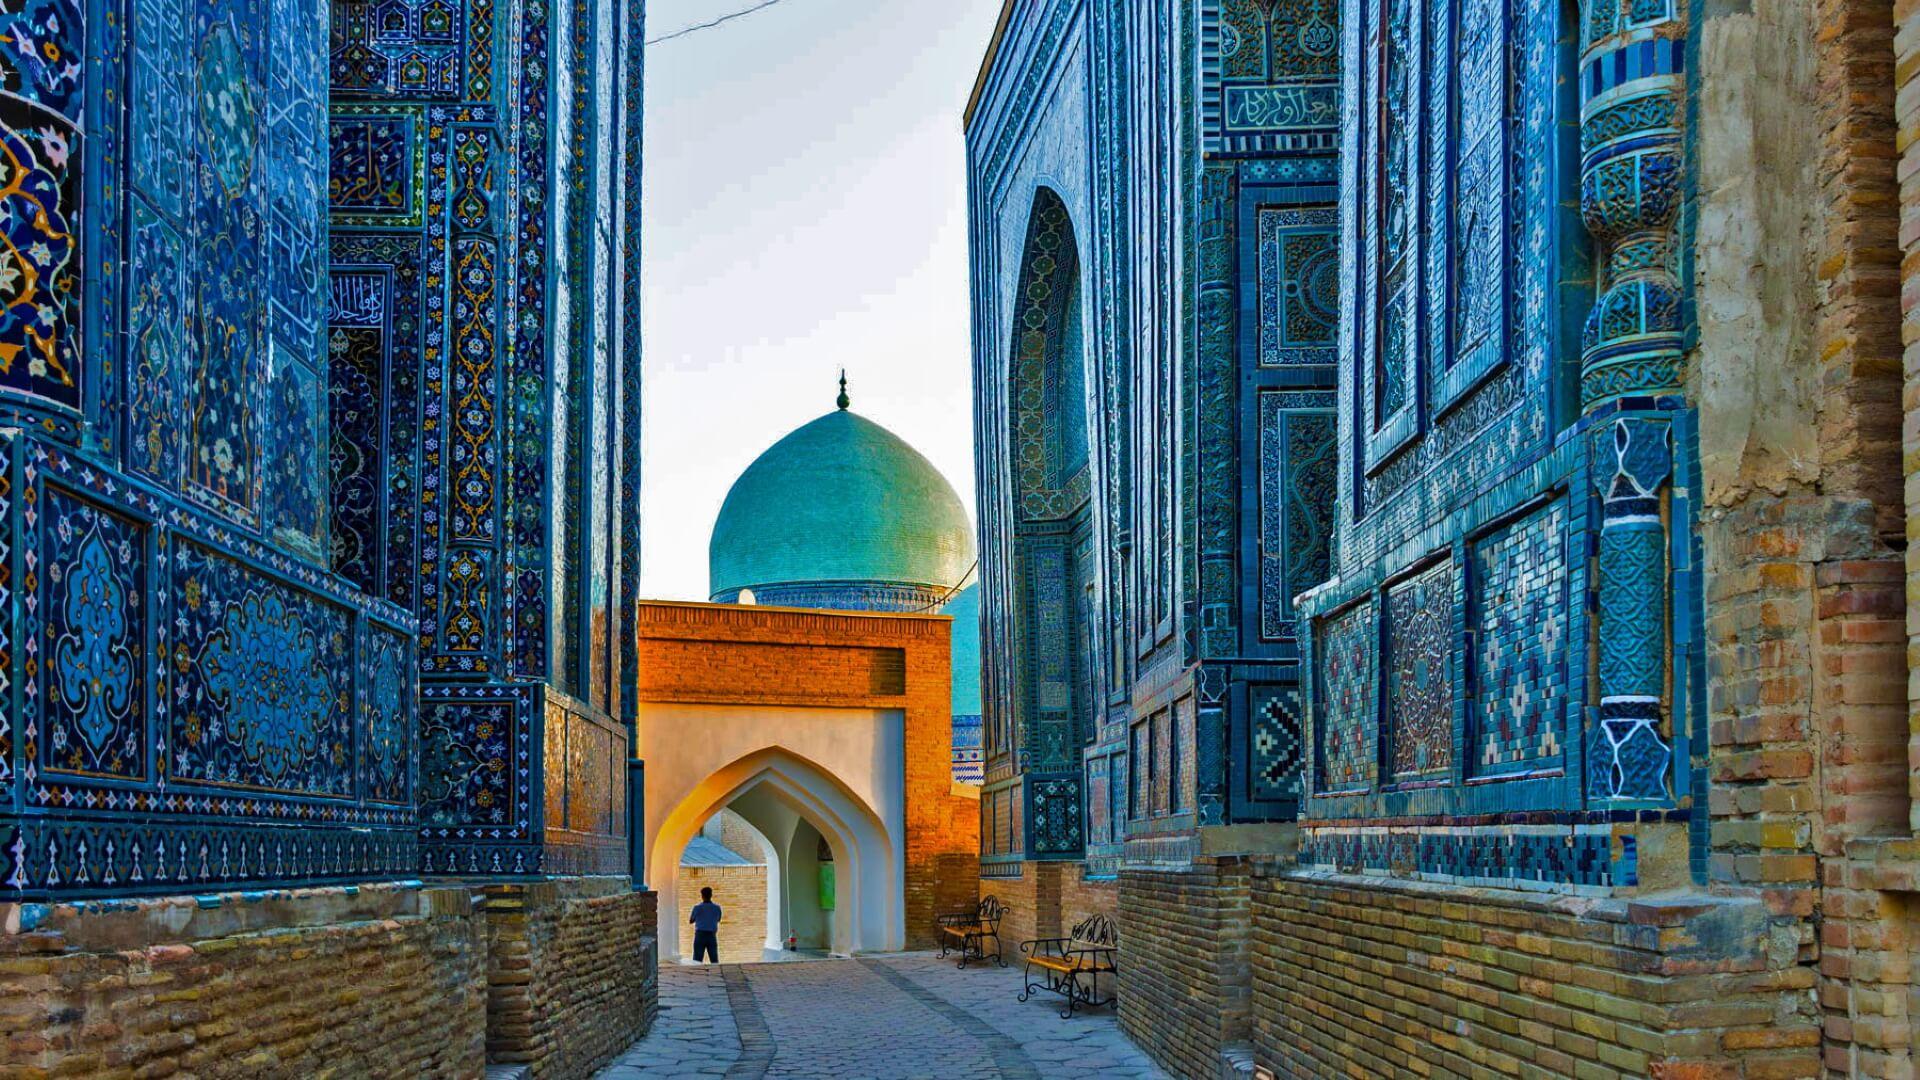 Узбекистан и Таджикистан: две страны в одном туре